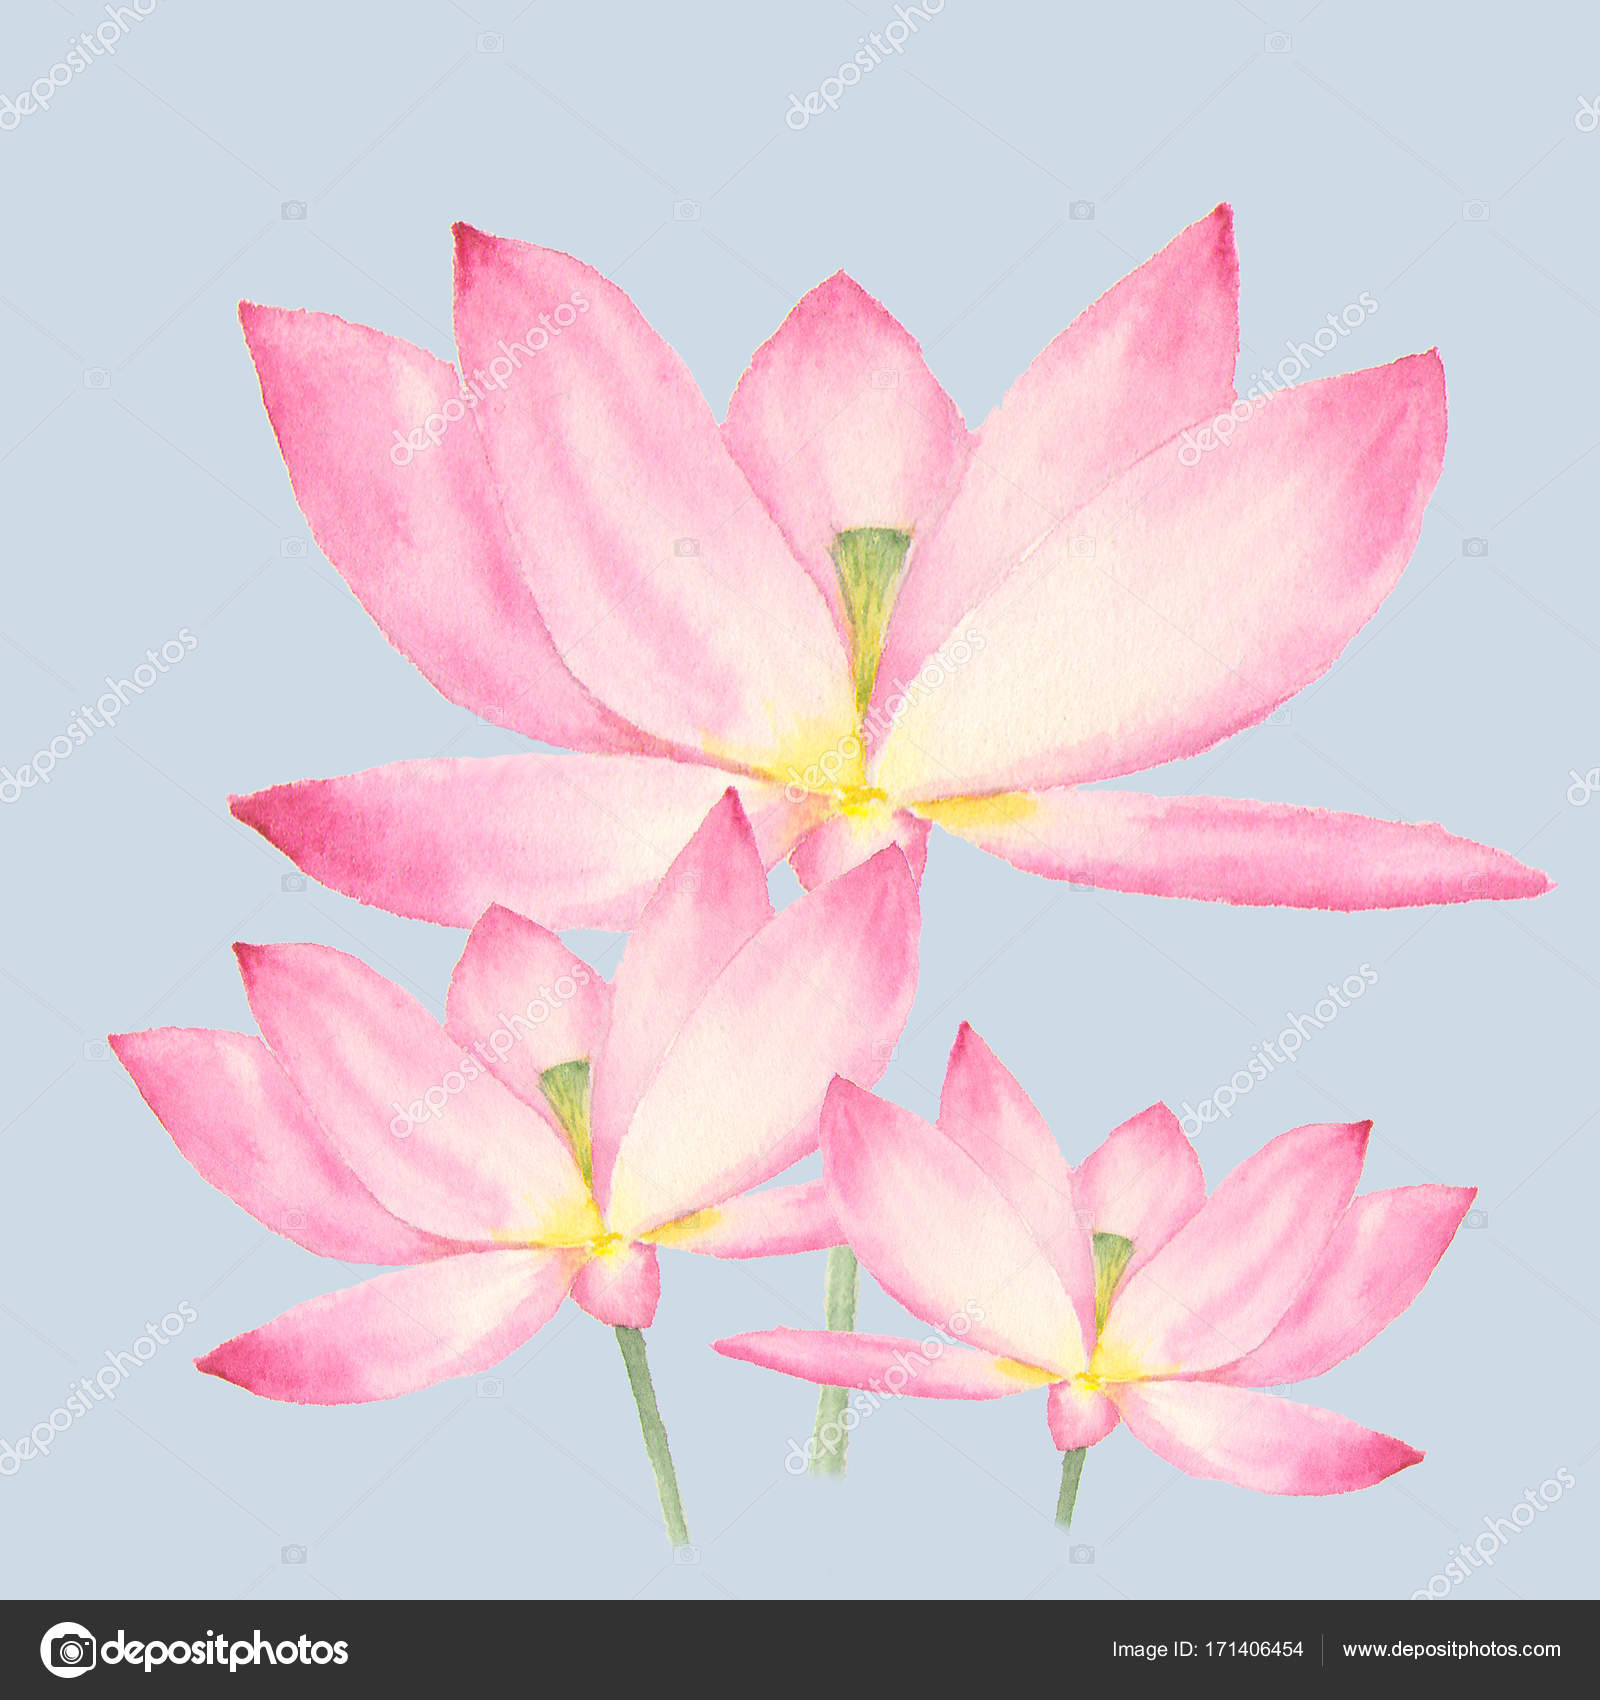 Botanical Watercolor Illustration Of Lotus Flowers On Blue